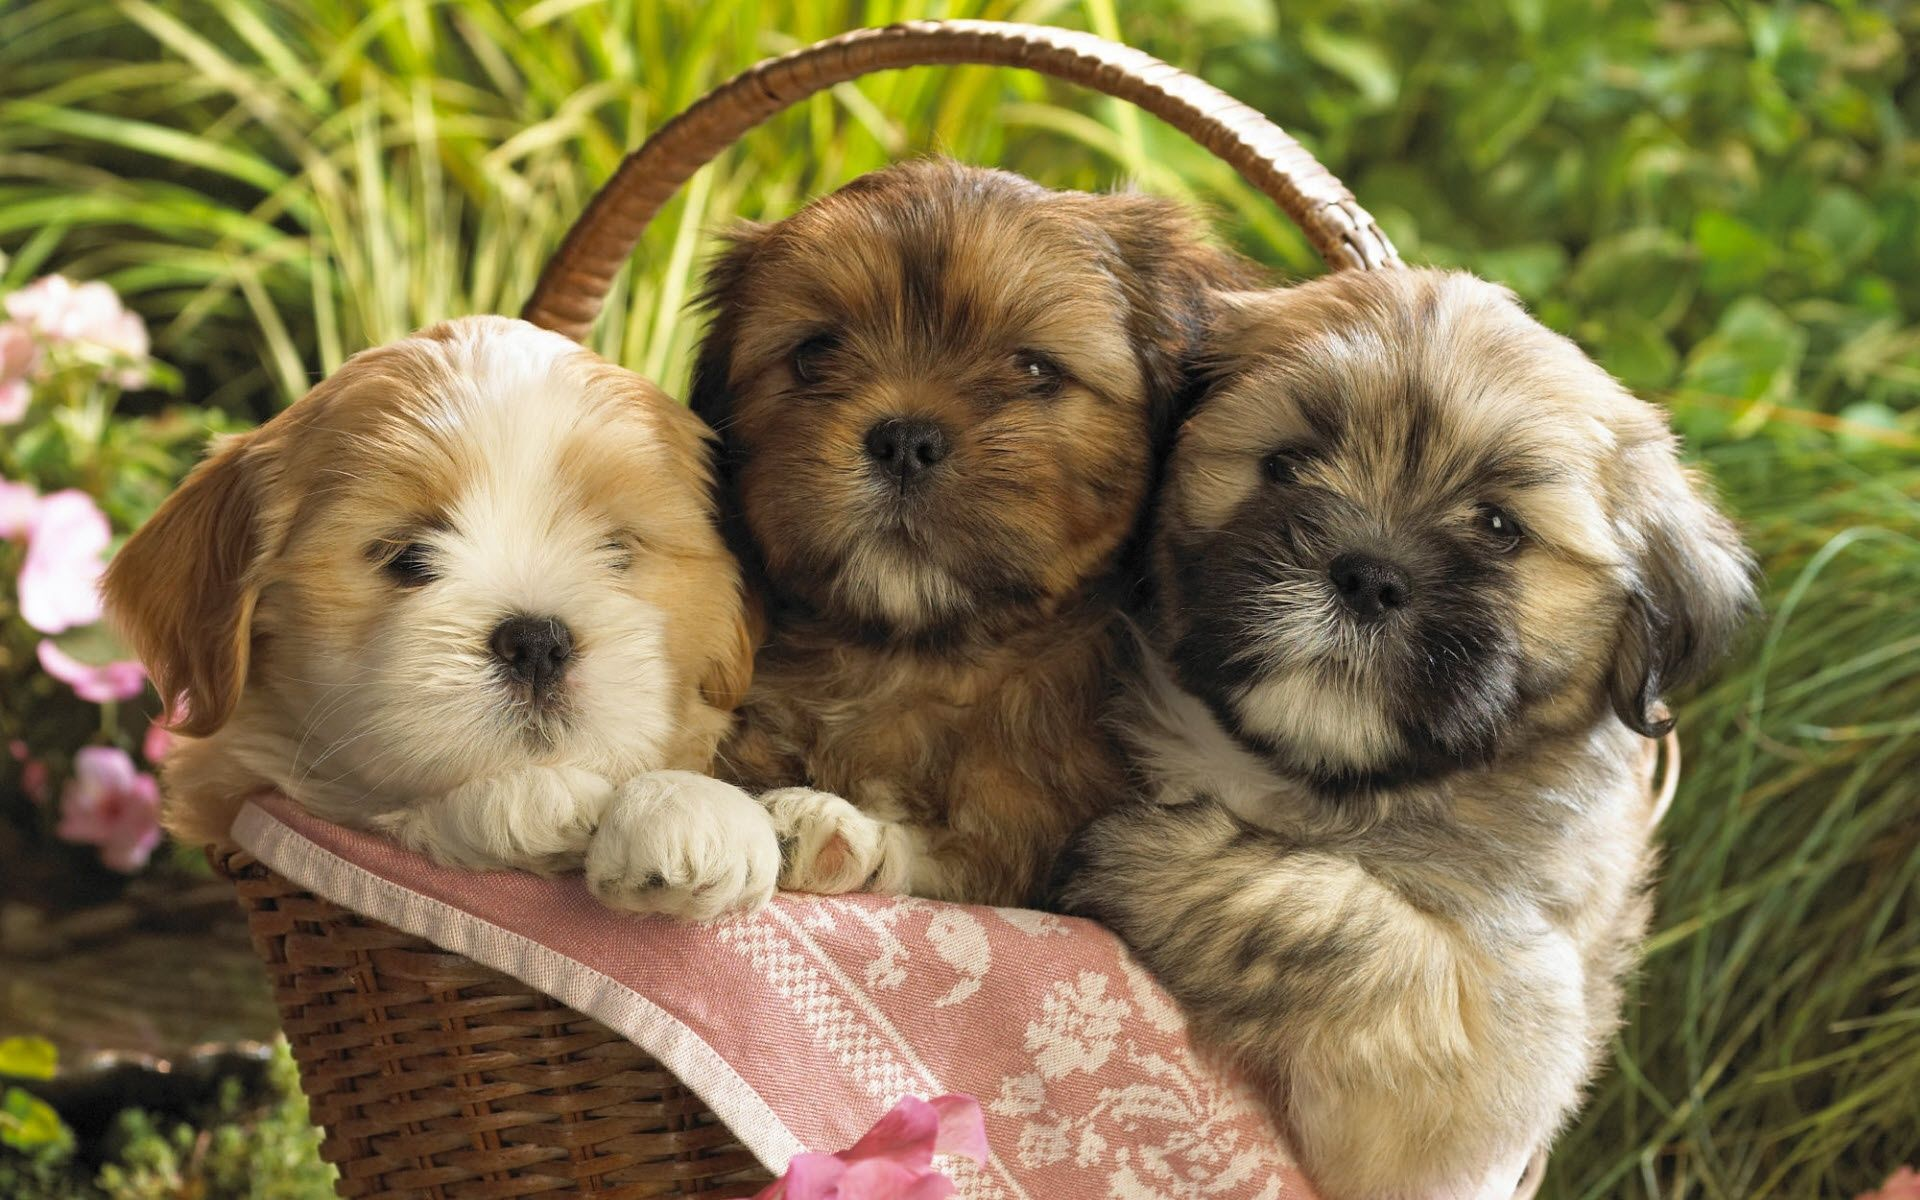 Cute Puppy Backgrounds Description Download Cute Puppies 2 Wallpaper Desktop Background In Teddy Bear Puppies Puppies Cute Puppy Wallpaper